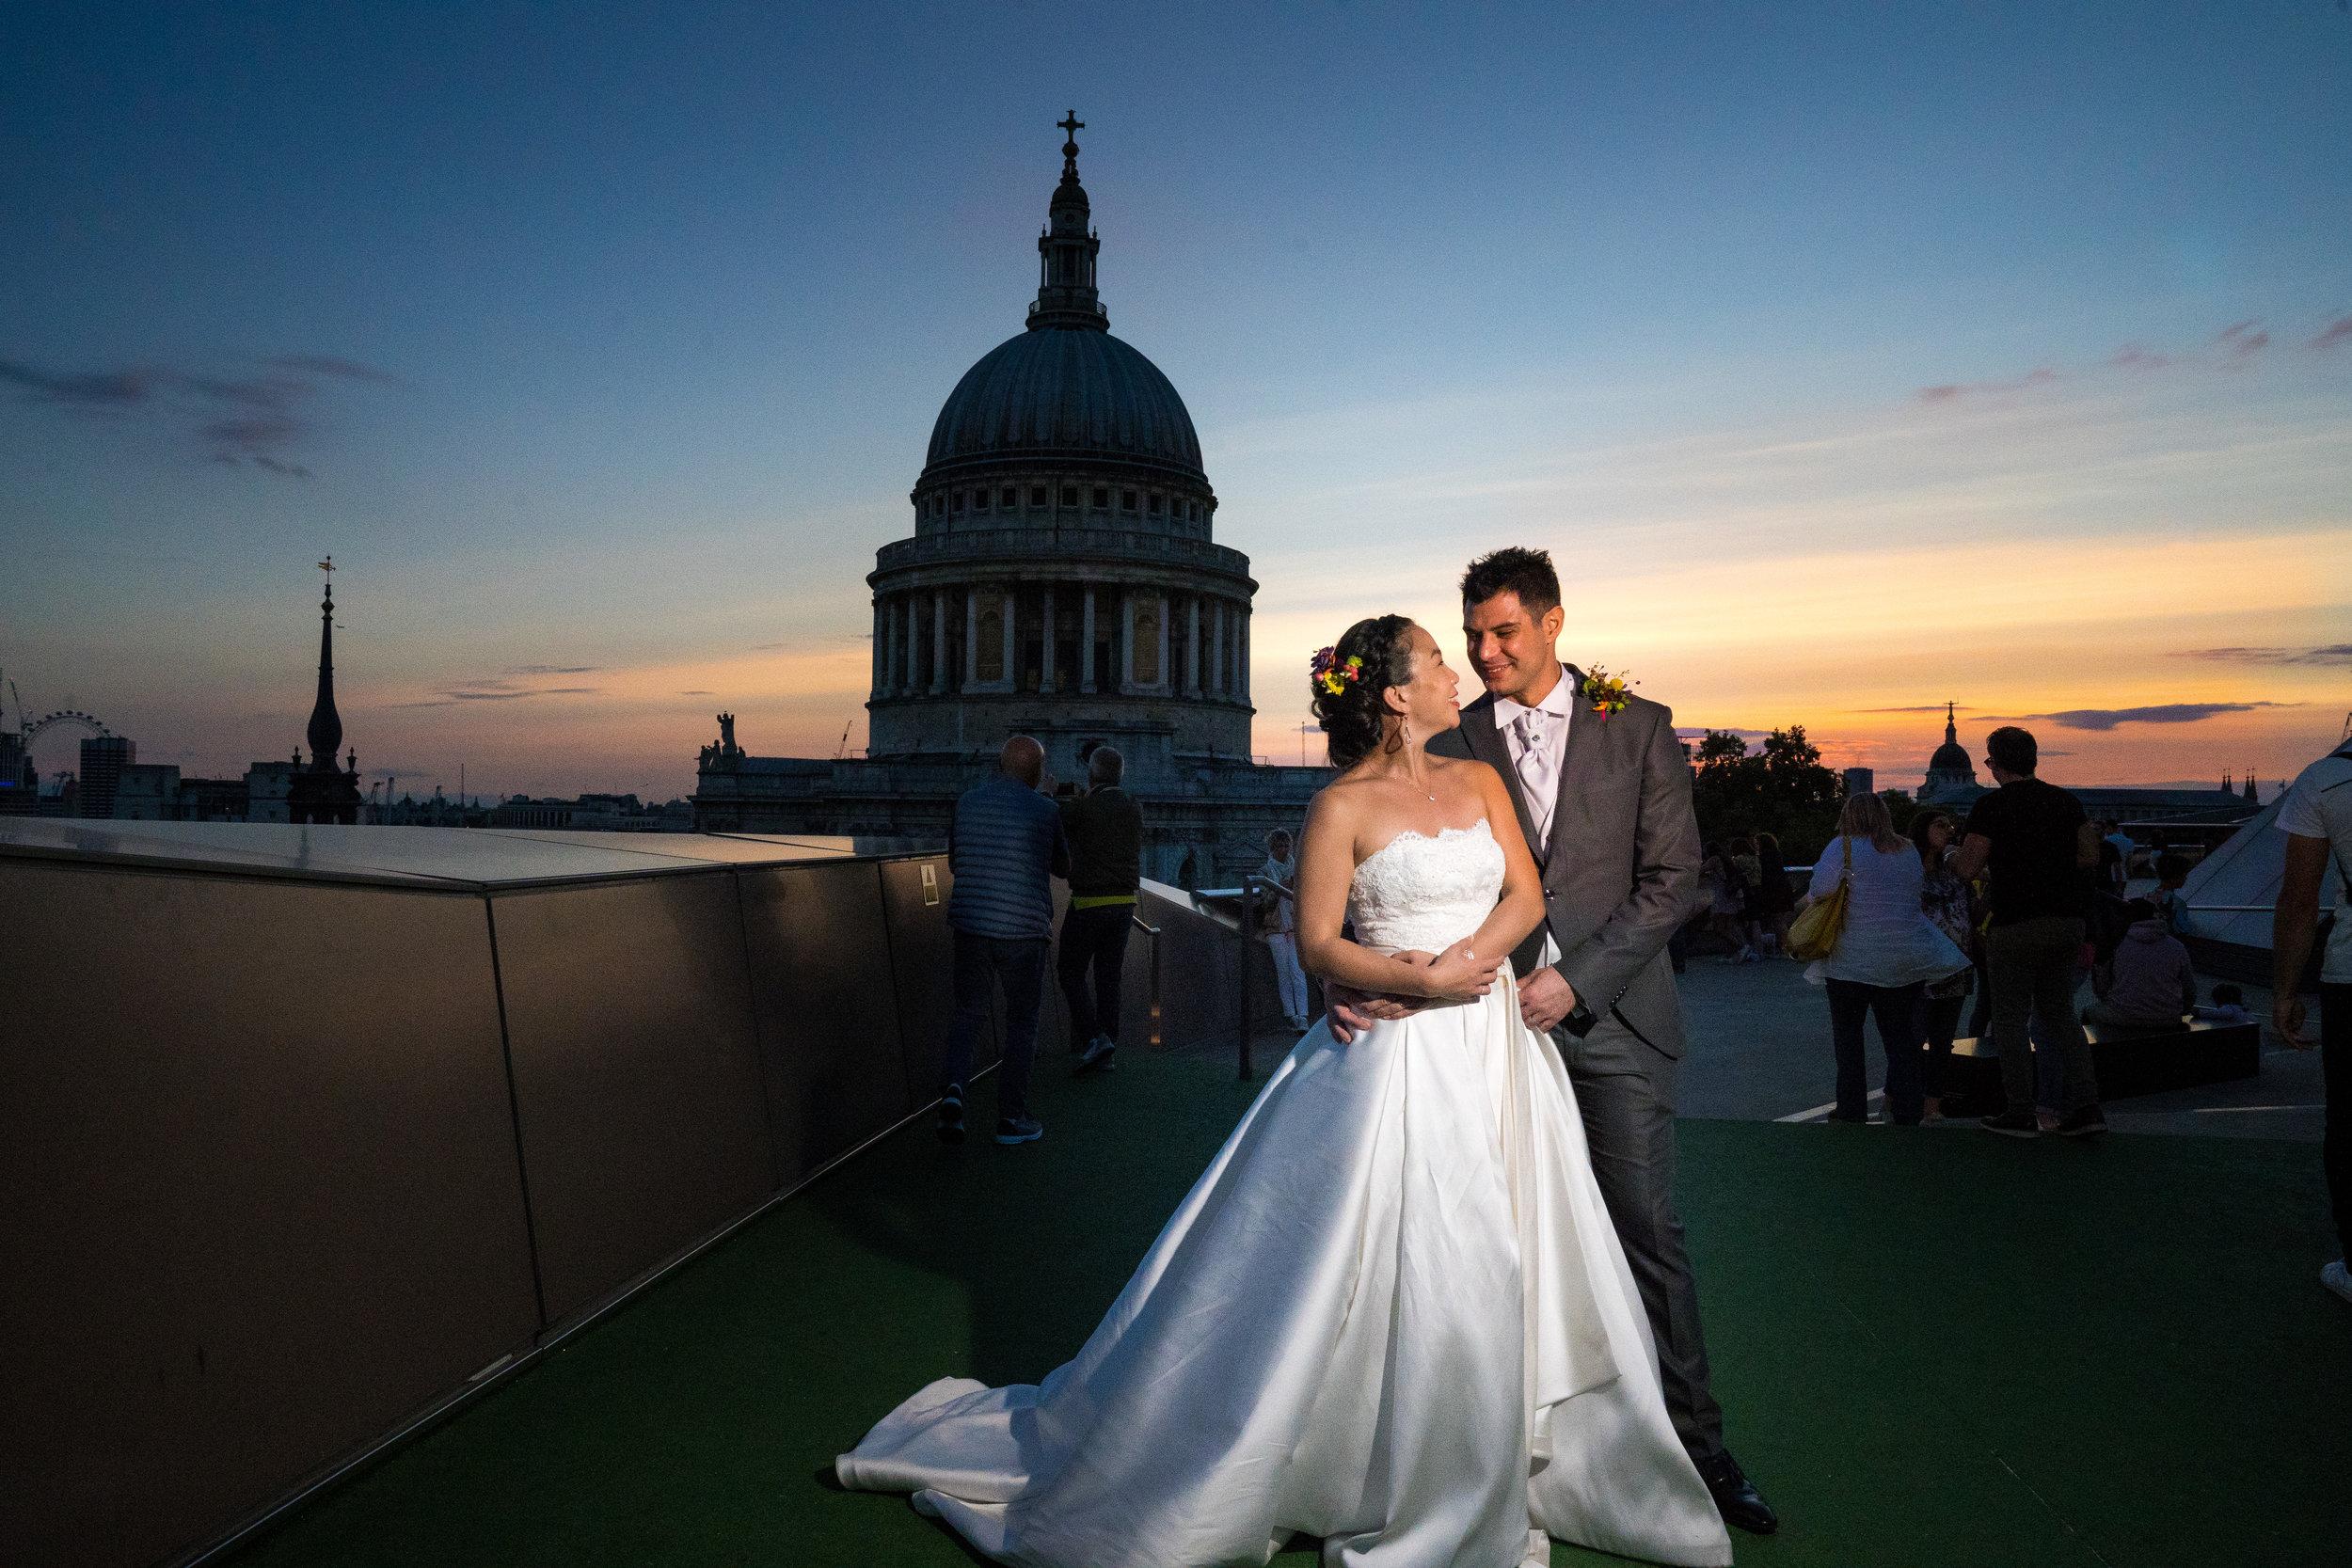 river-rooms-tower-bridge-london-stpauls-mondrian-hotel-wedding-photography-videography-741